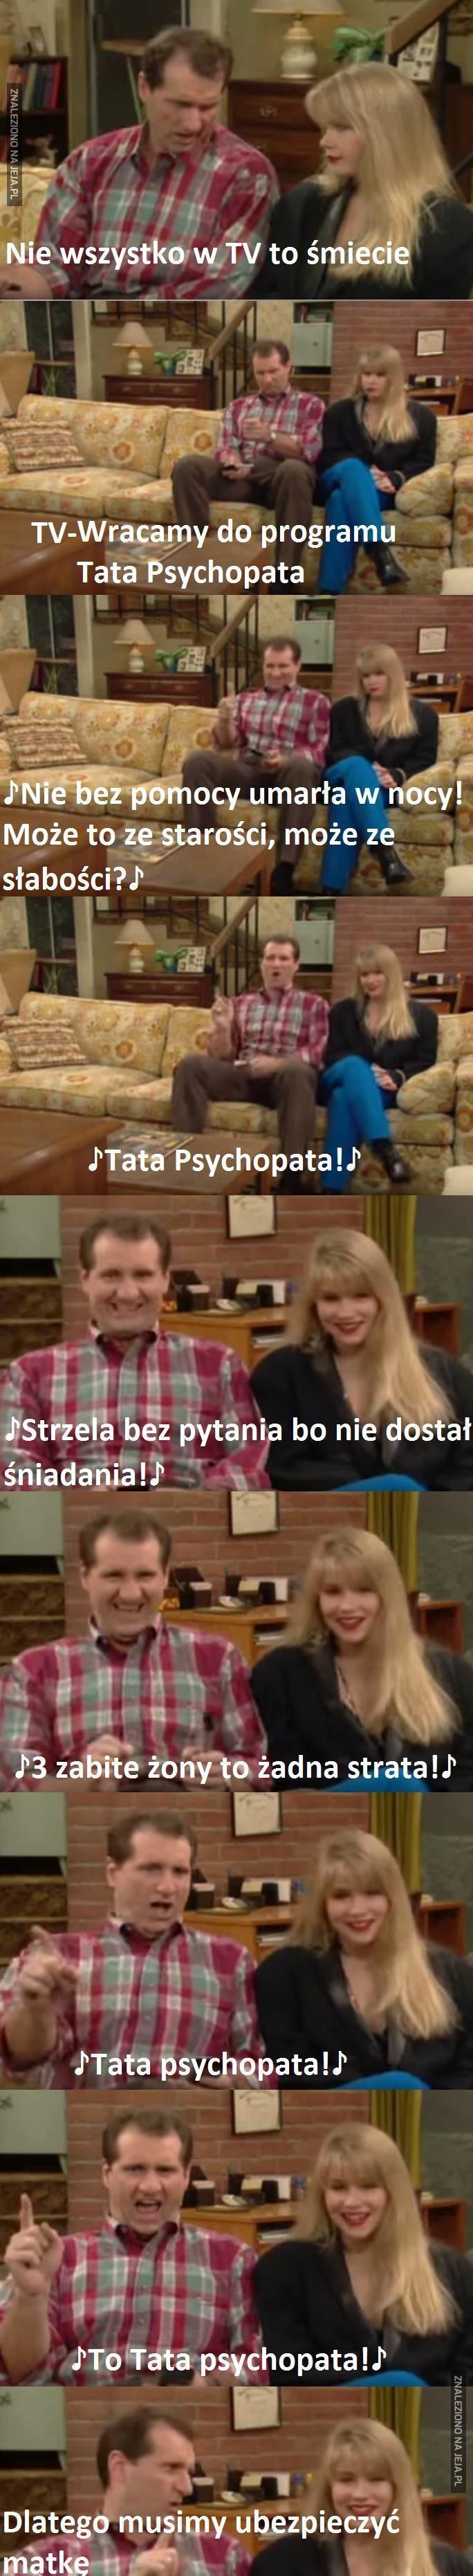 Tata psychopata